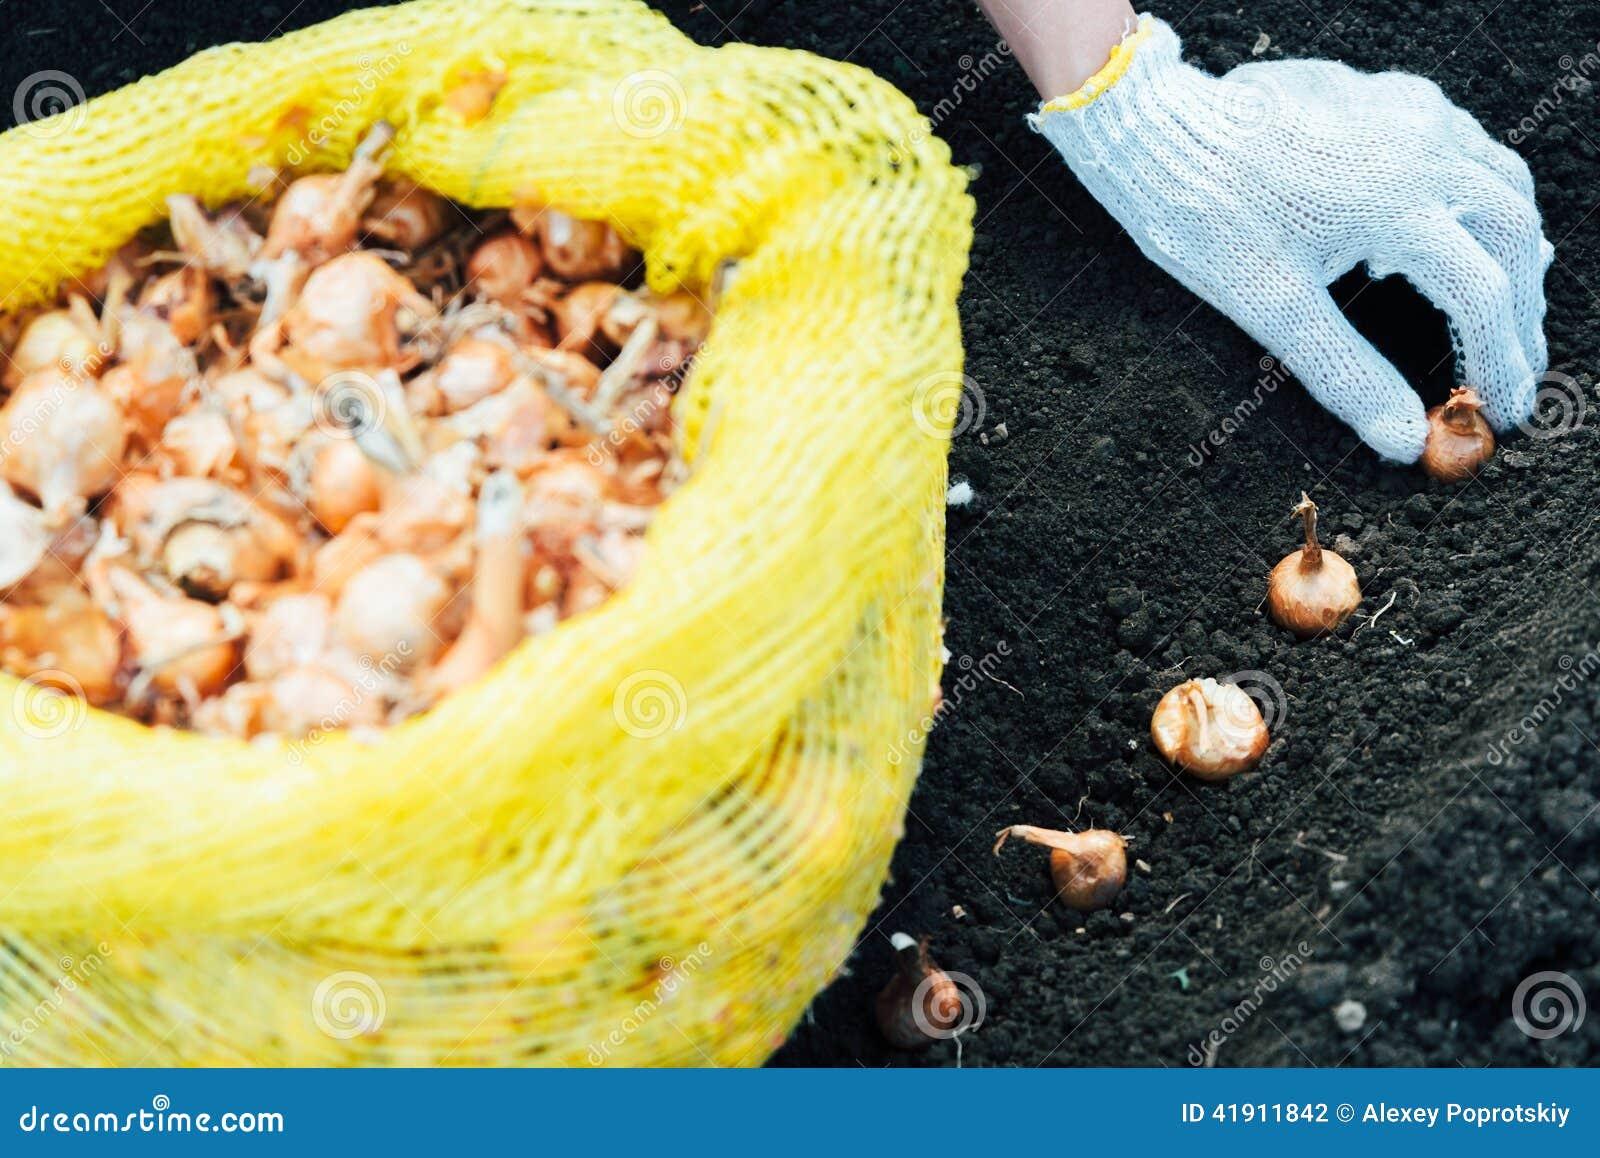 Ogrodniczka zasadza cebulkowe rozsady